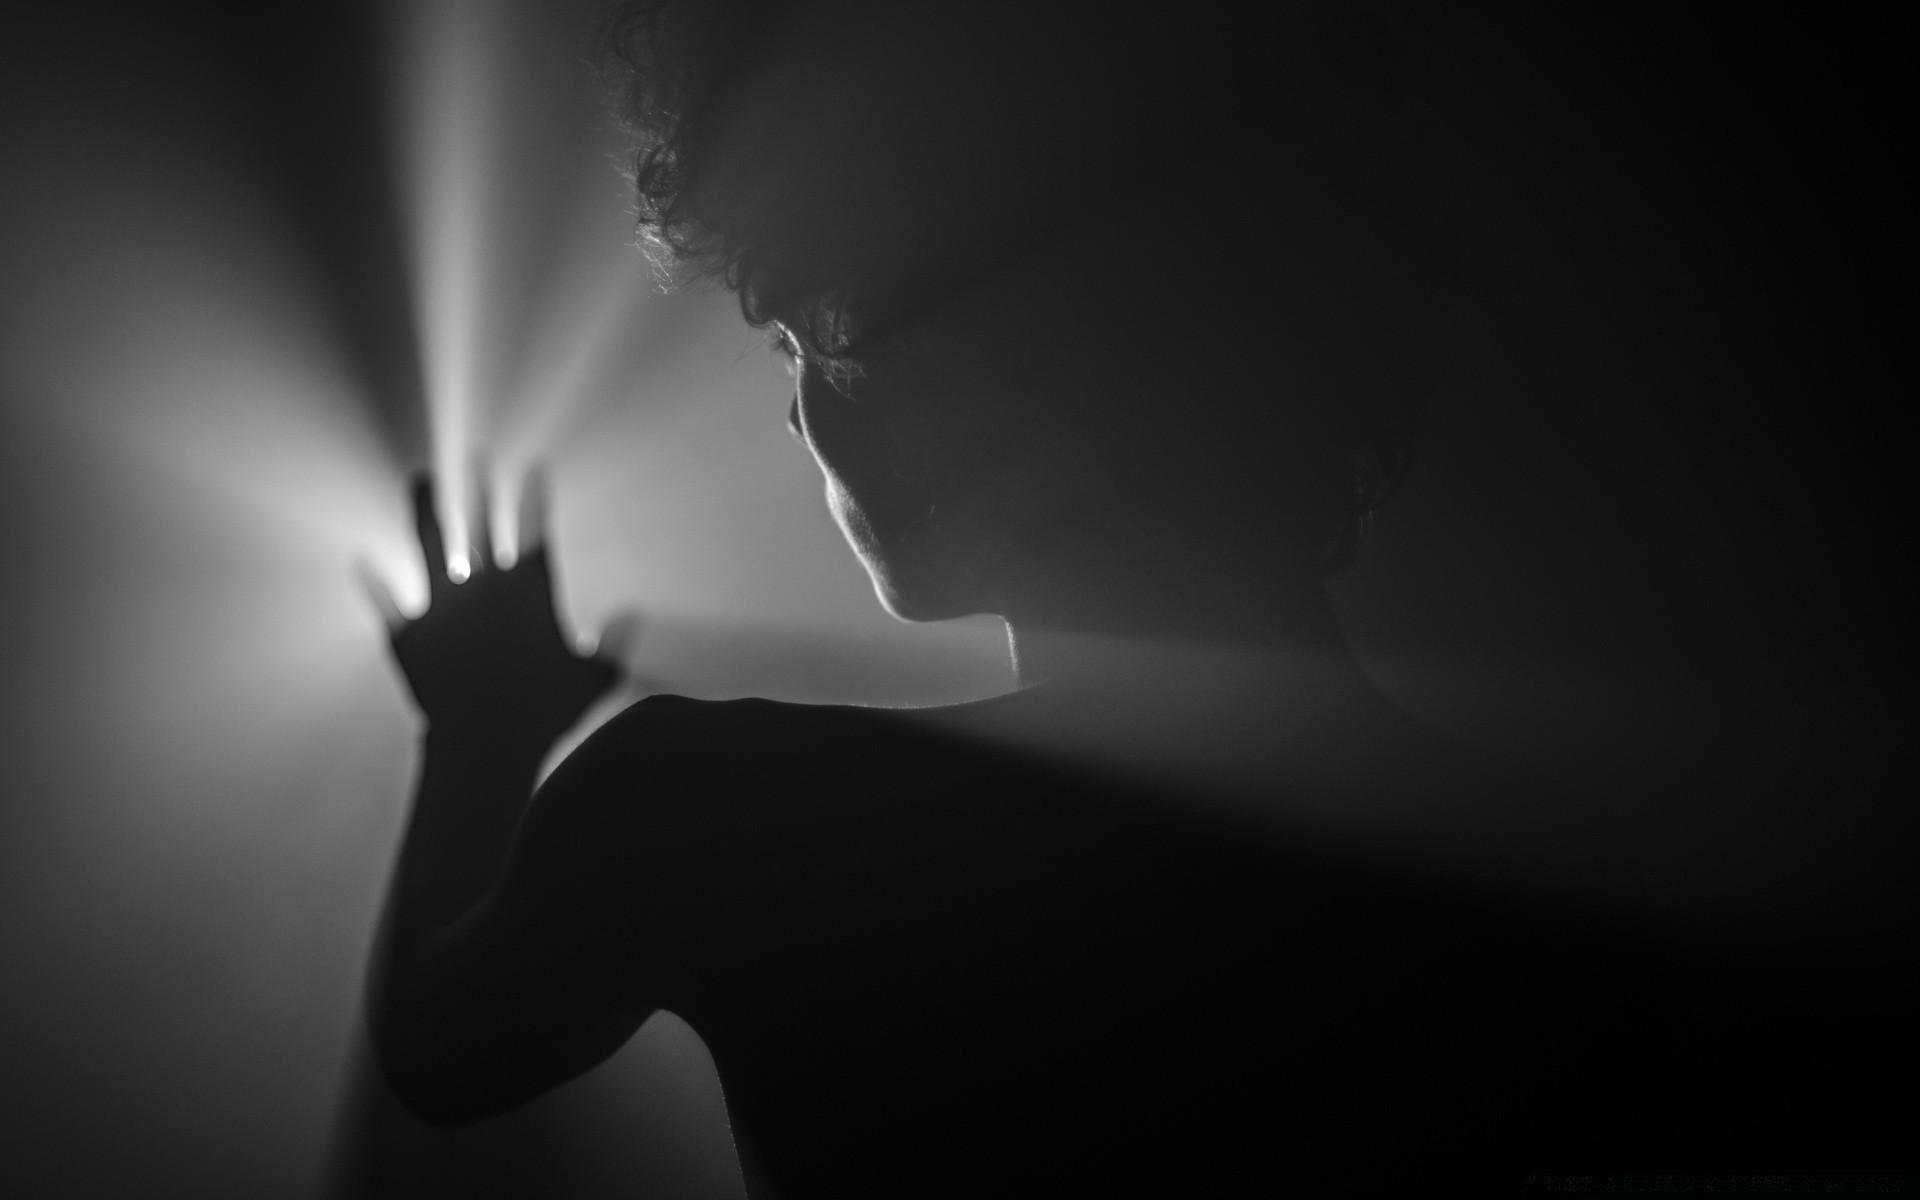 Black And White Monochrome Art Silhouette Dark Concert - Light Of Darkness - HD Wallpaper